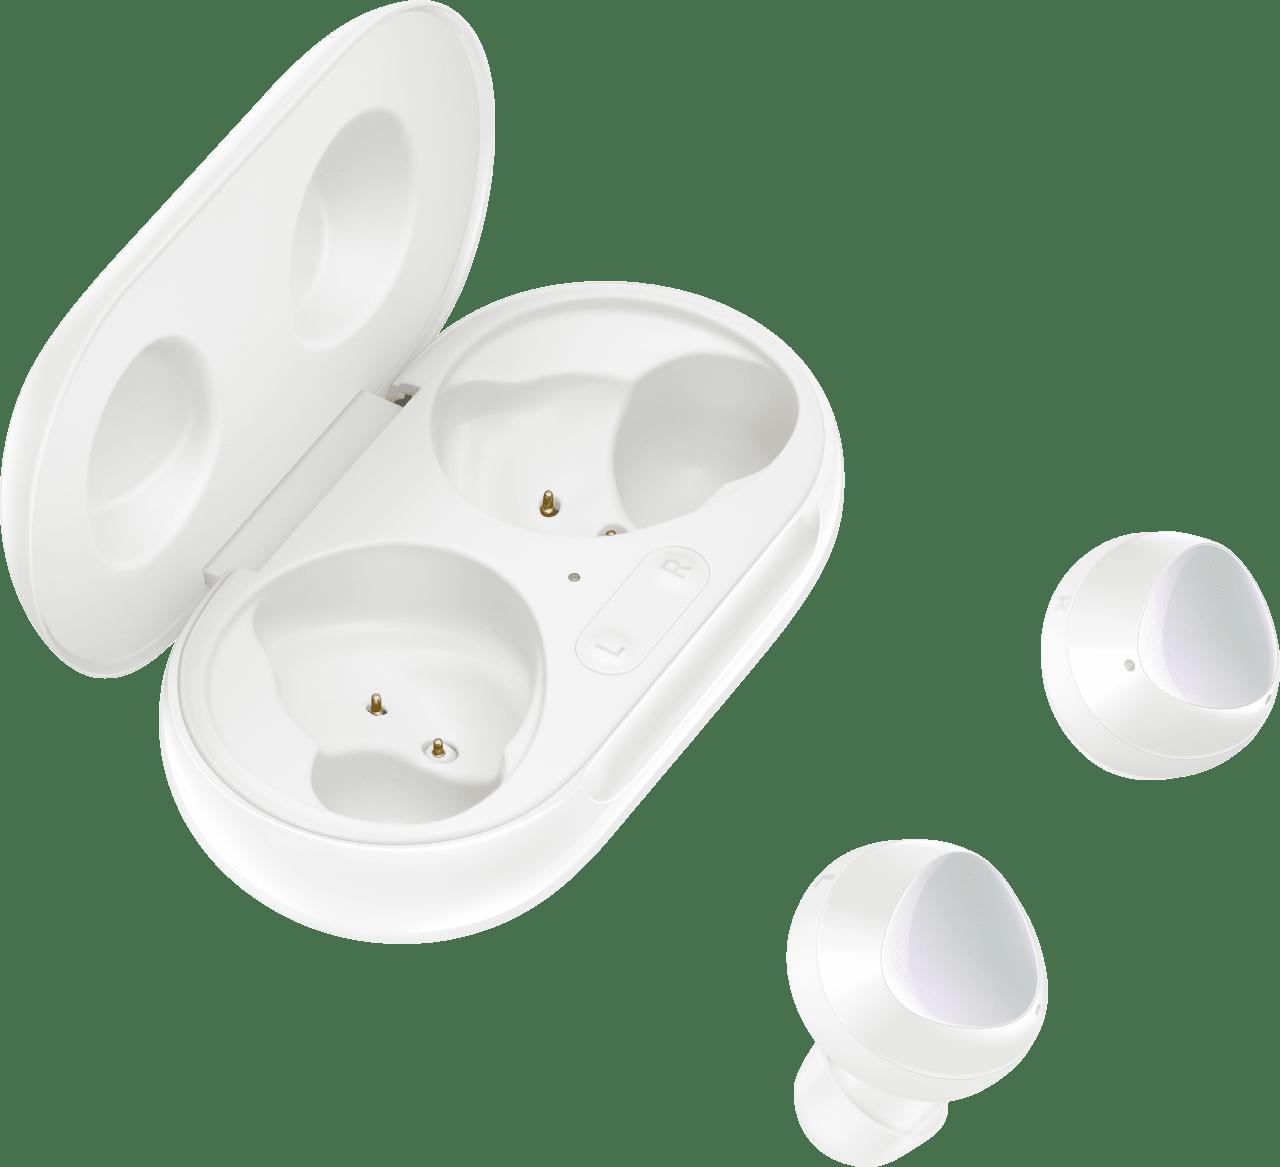 White Samsung Galaxy Buds+ In-ear Bluetooth Headphones.4